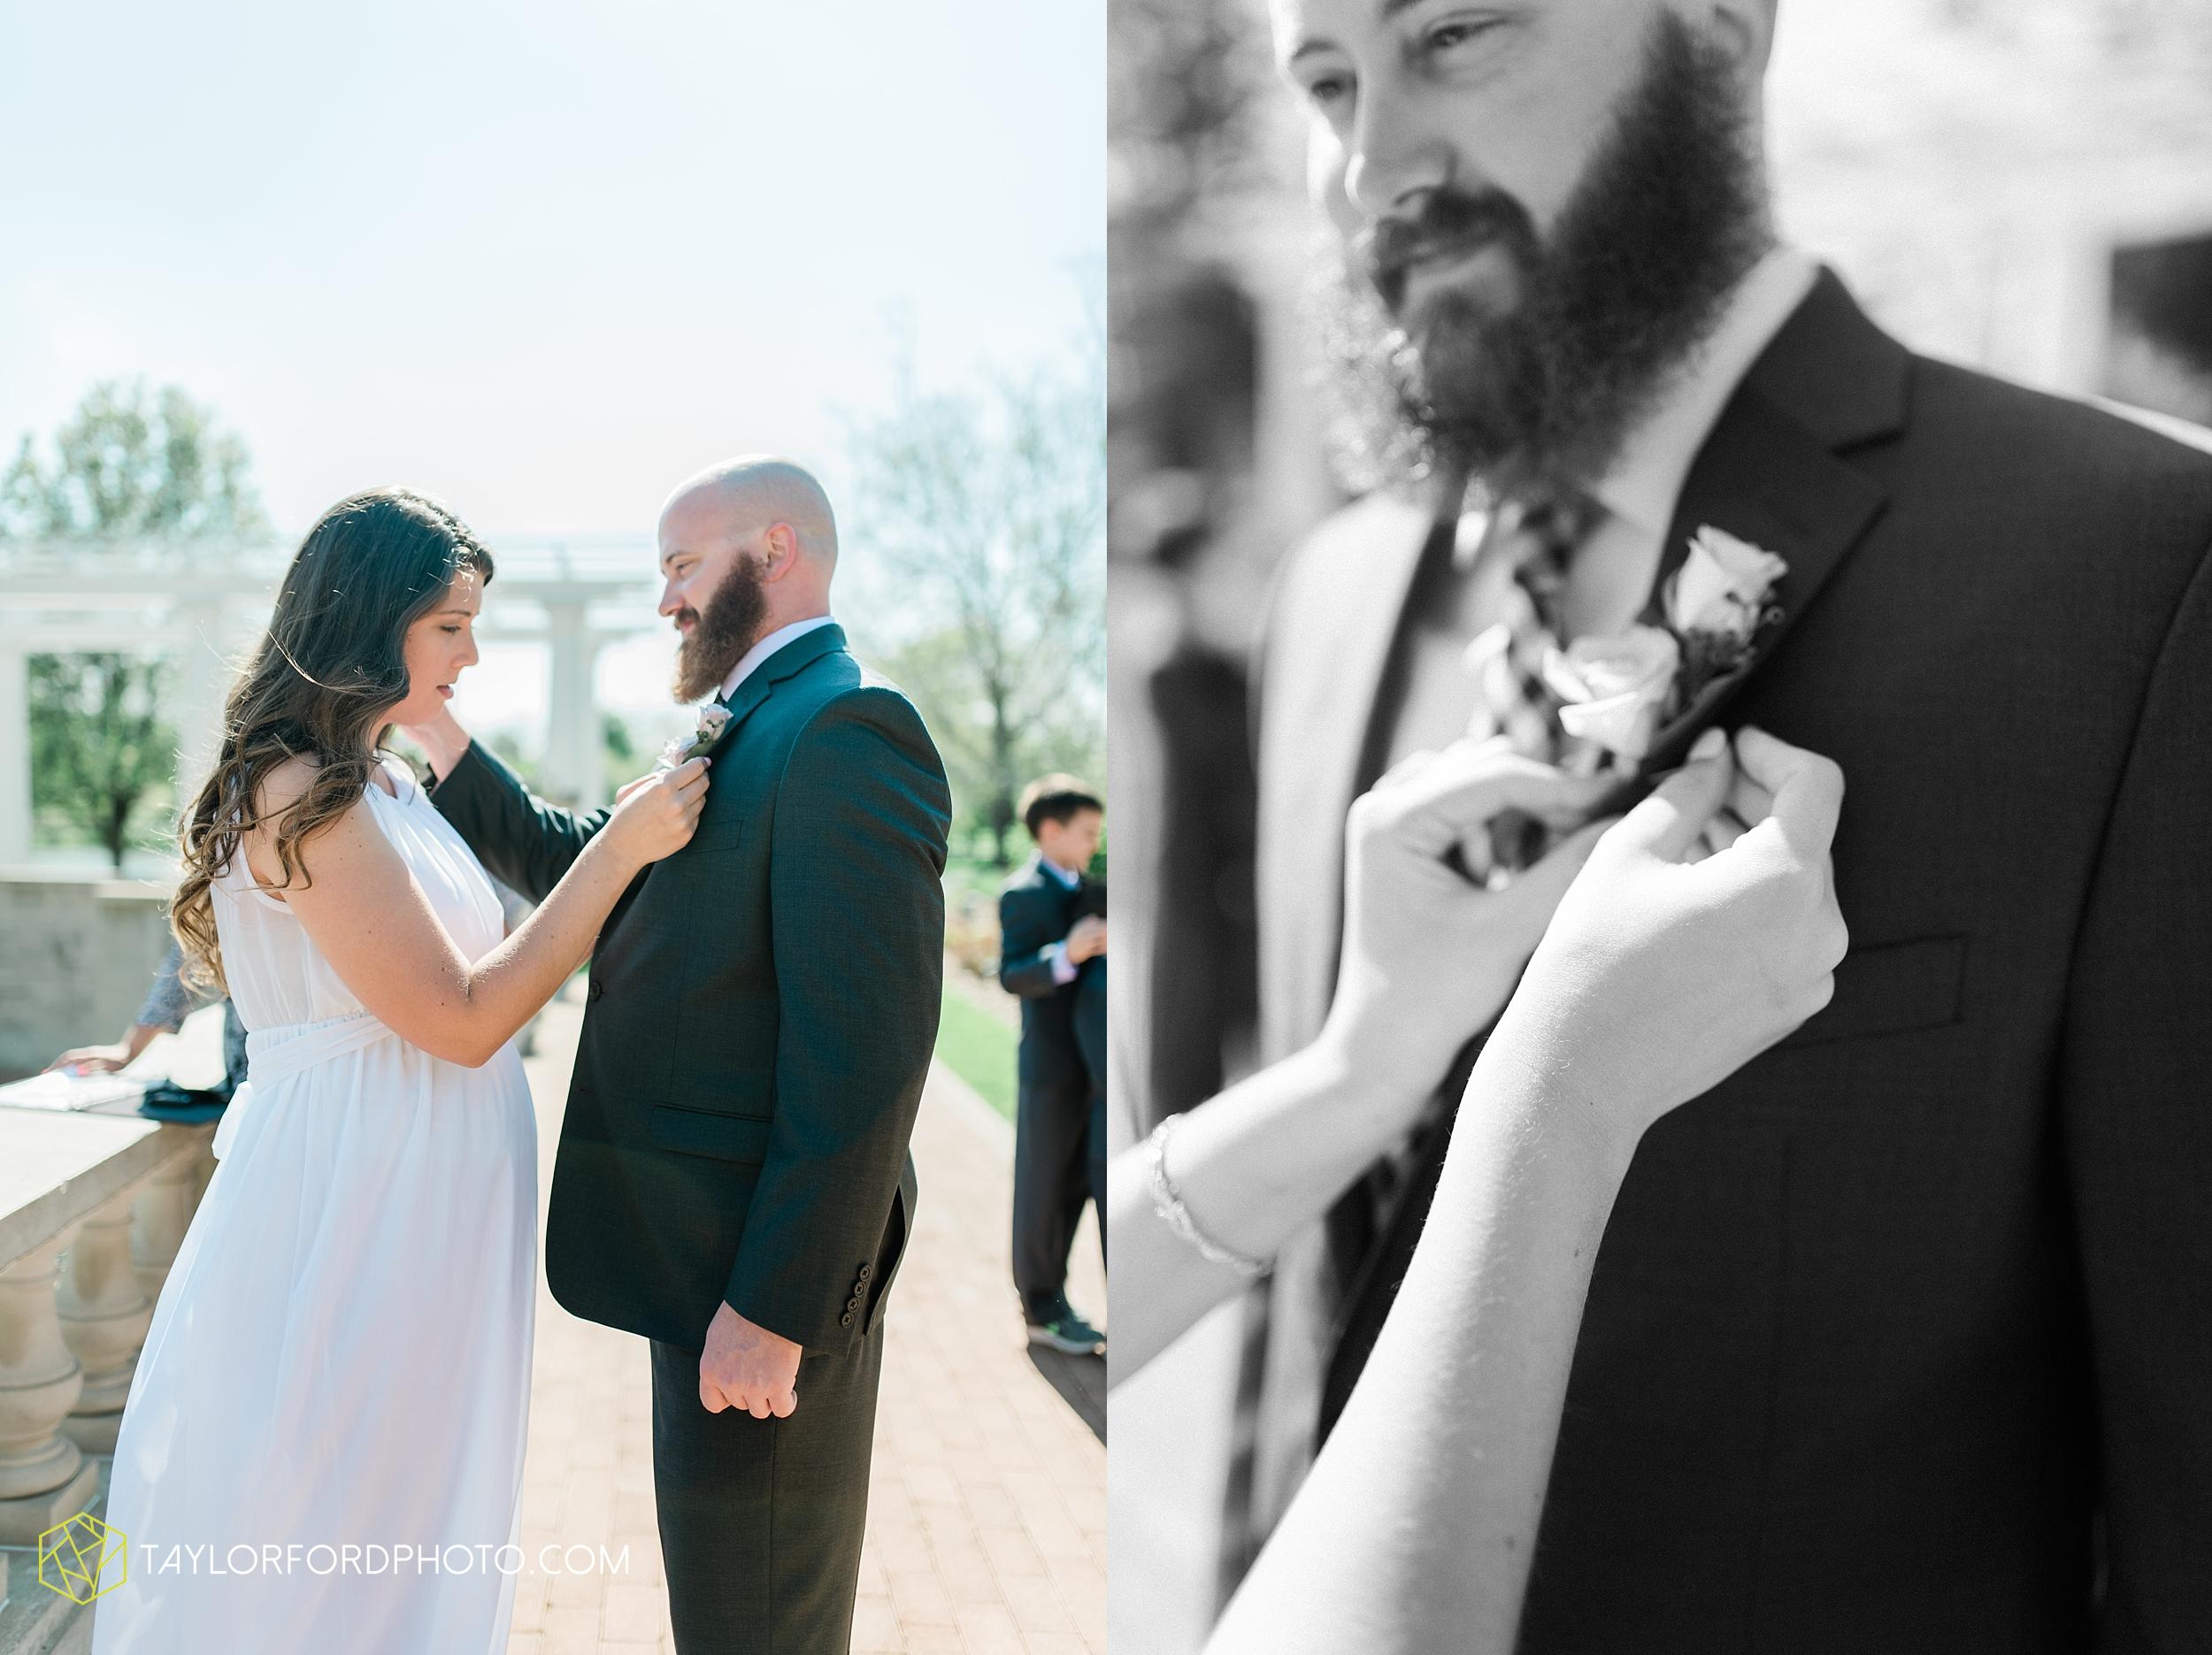 lakeside-rose-gardens-fort-wayne-indiana-elopement-wedding-photographer-Taylor-Ford-Photography_7137.jpg